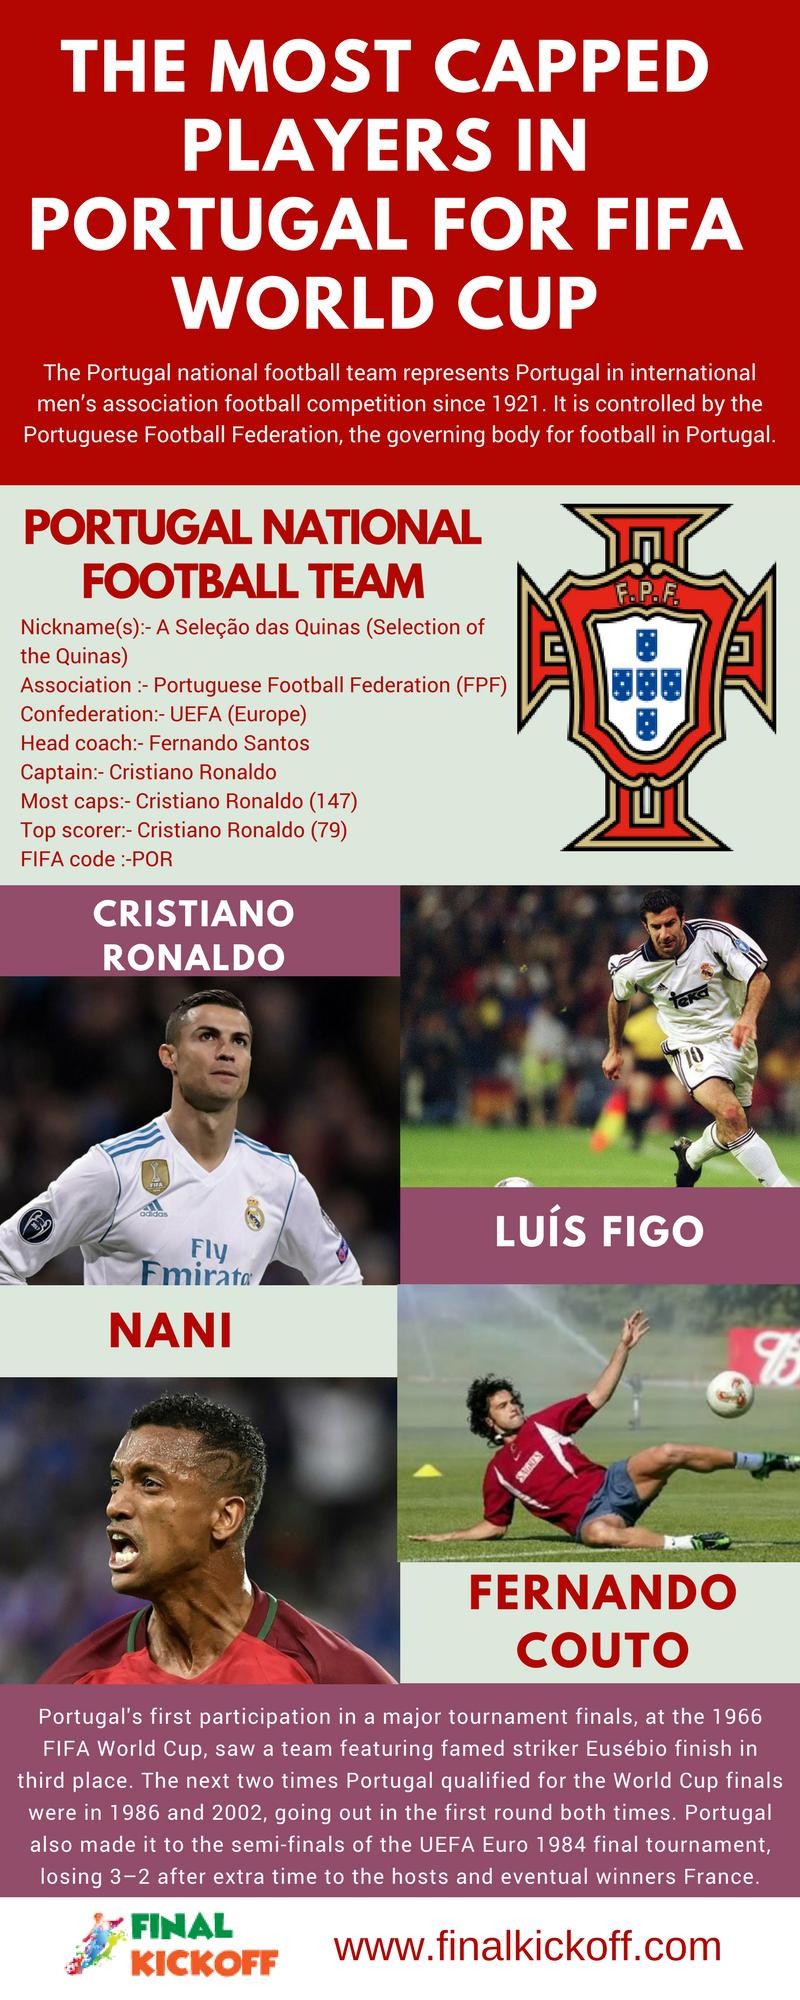 top+scorer+in+portugal+national+team